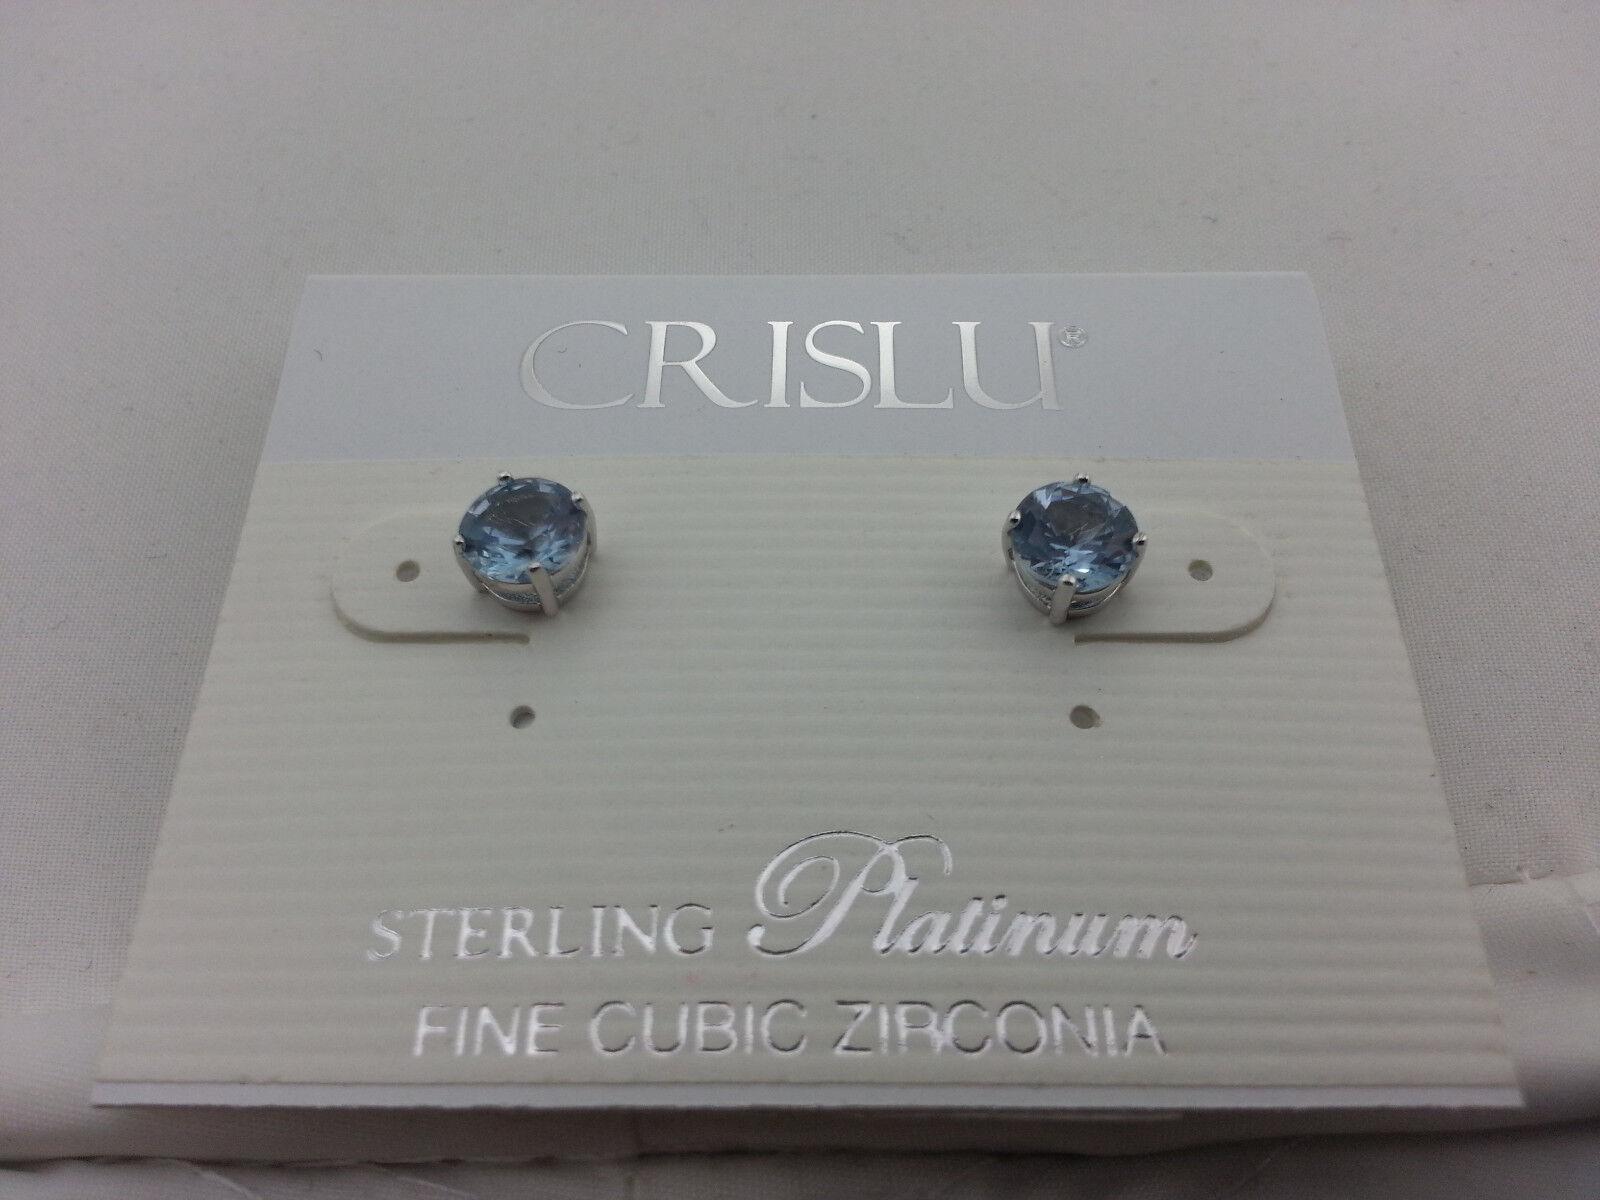 Crislu Sterling Platinum Earrings - Aqua Studs NWT R 60.00